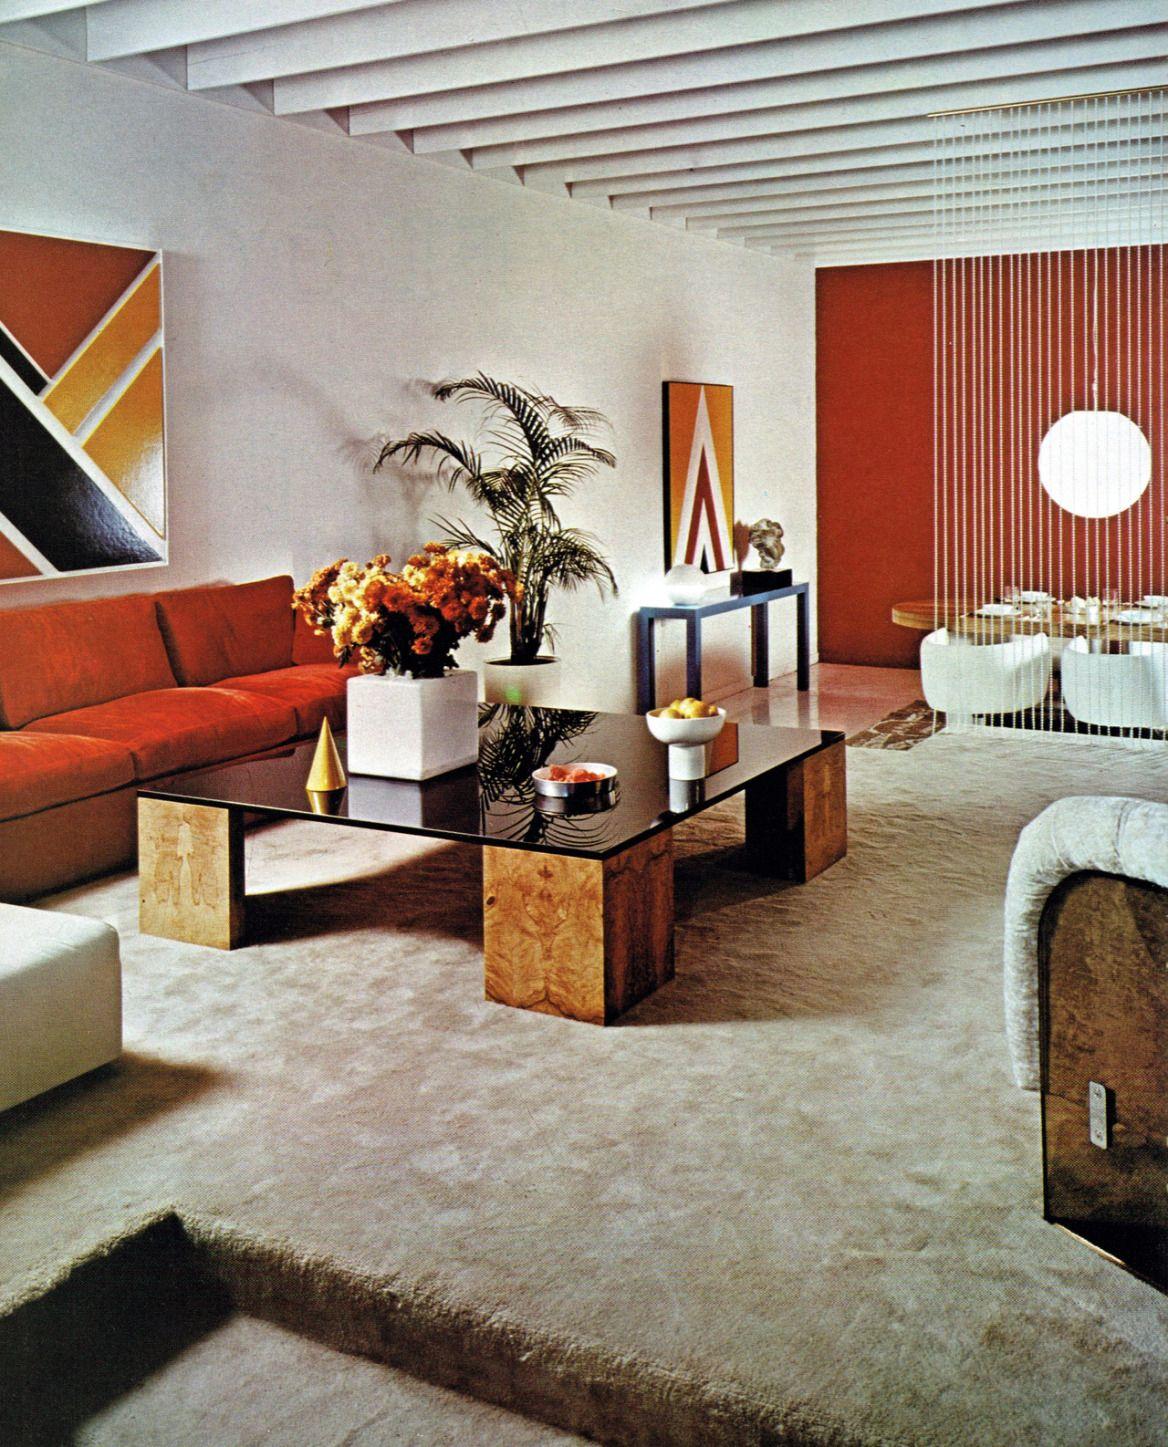 70's design trends